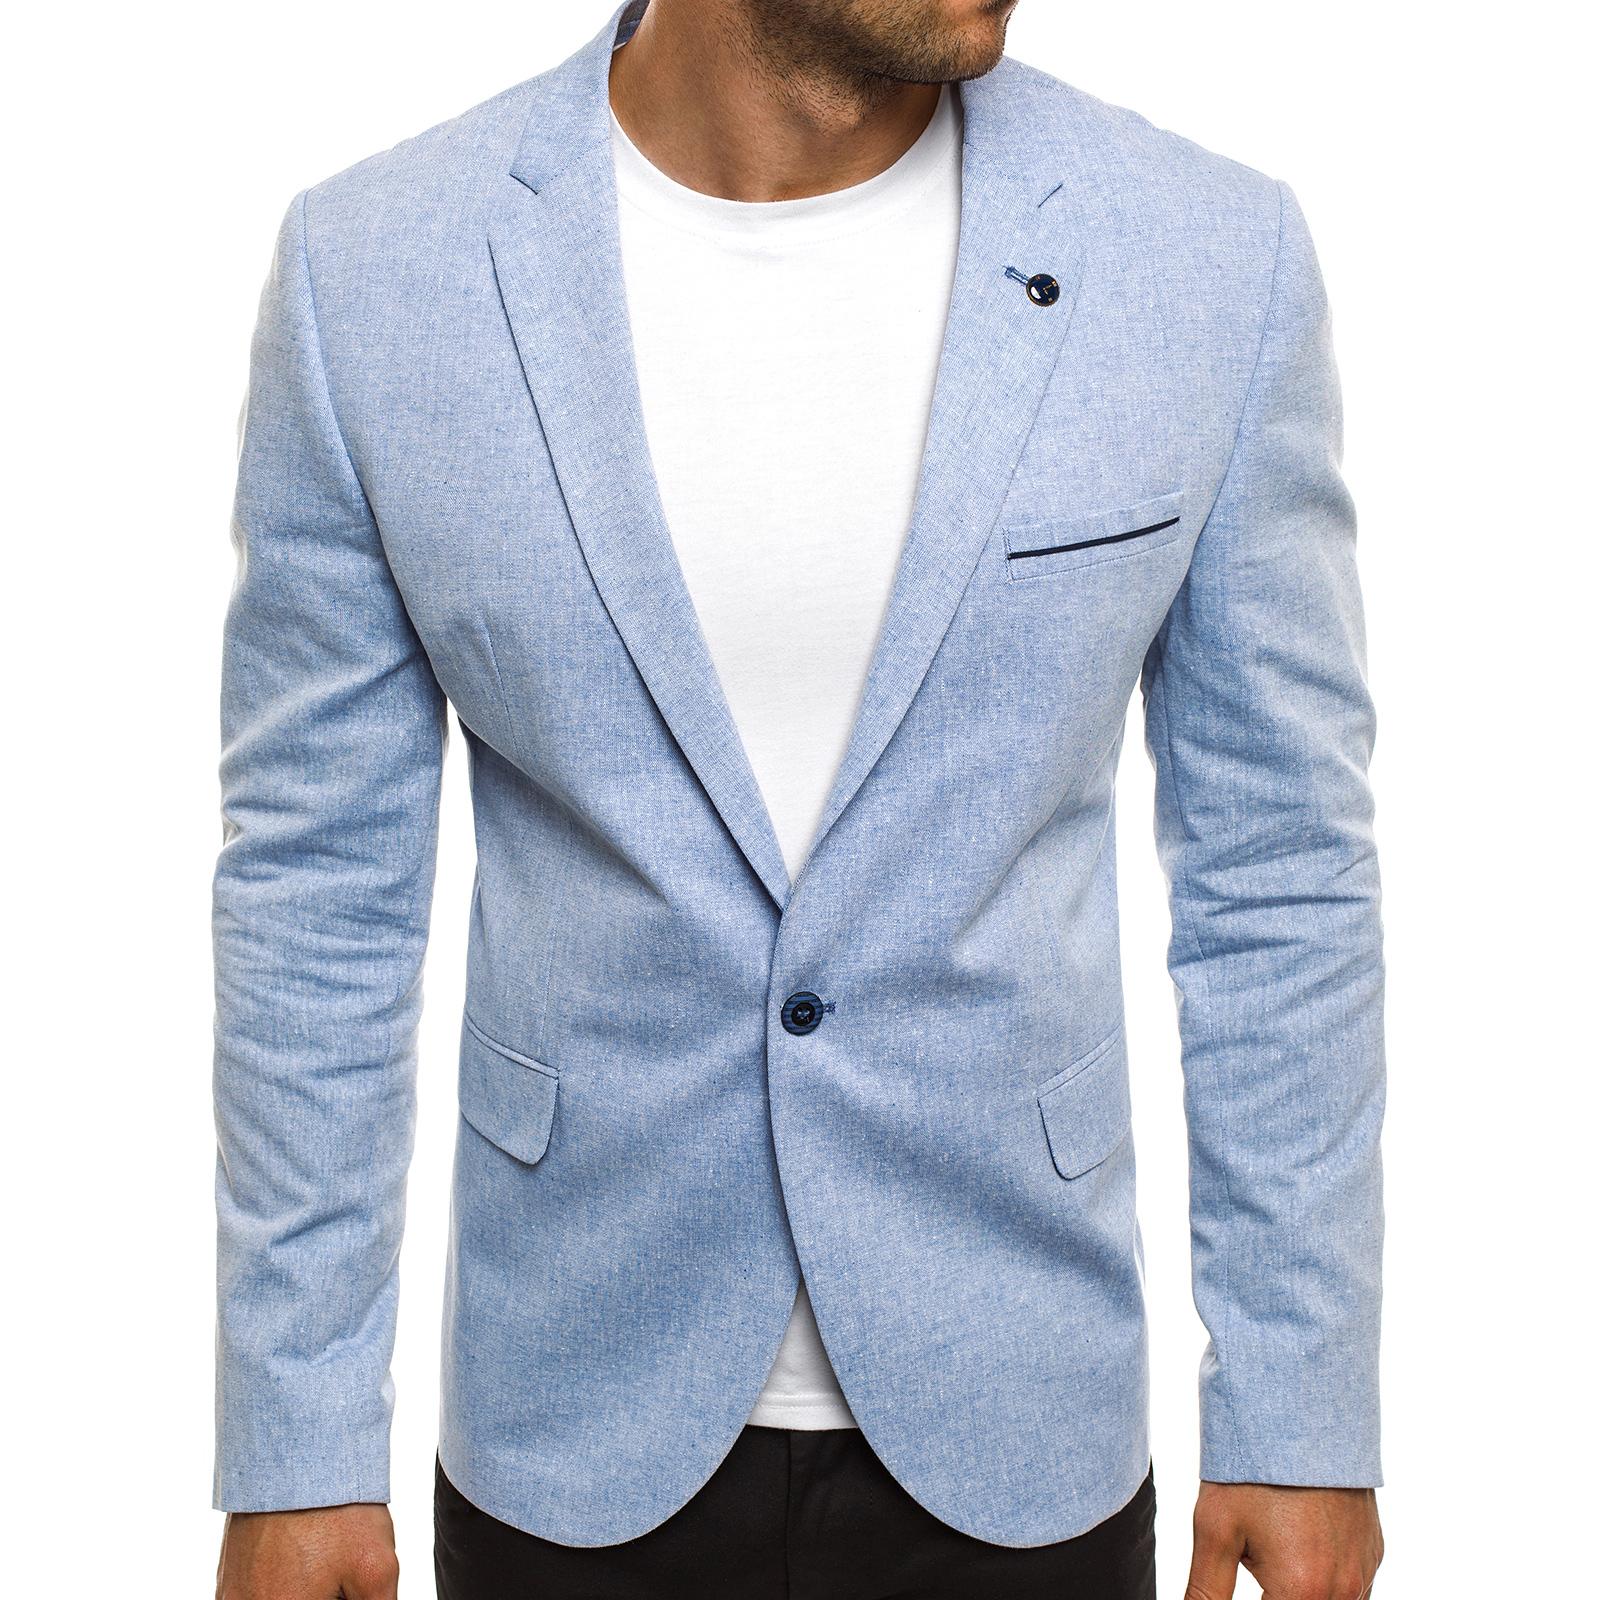 free shipping ac535 99e42 Completo Da Giacca Uomo Blazer Mix Sportiva Ozonee Ebay 422 ...